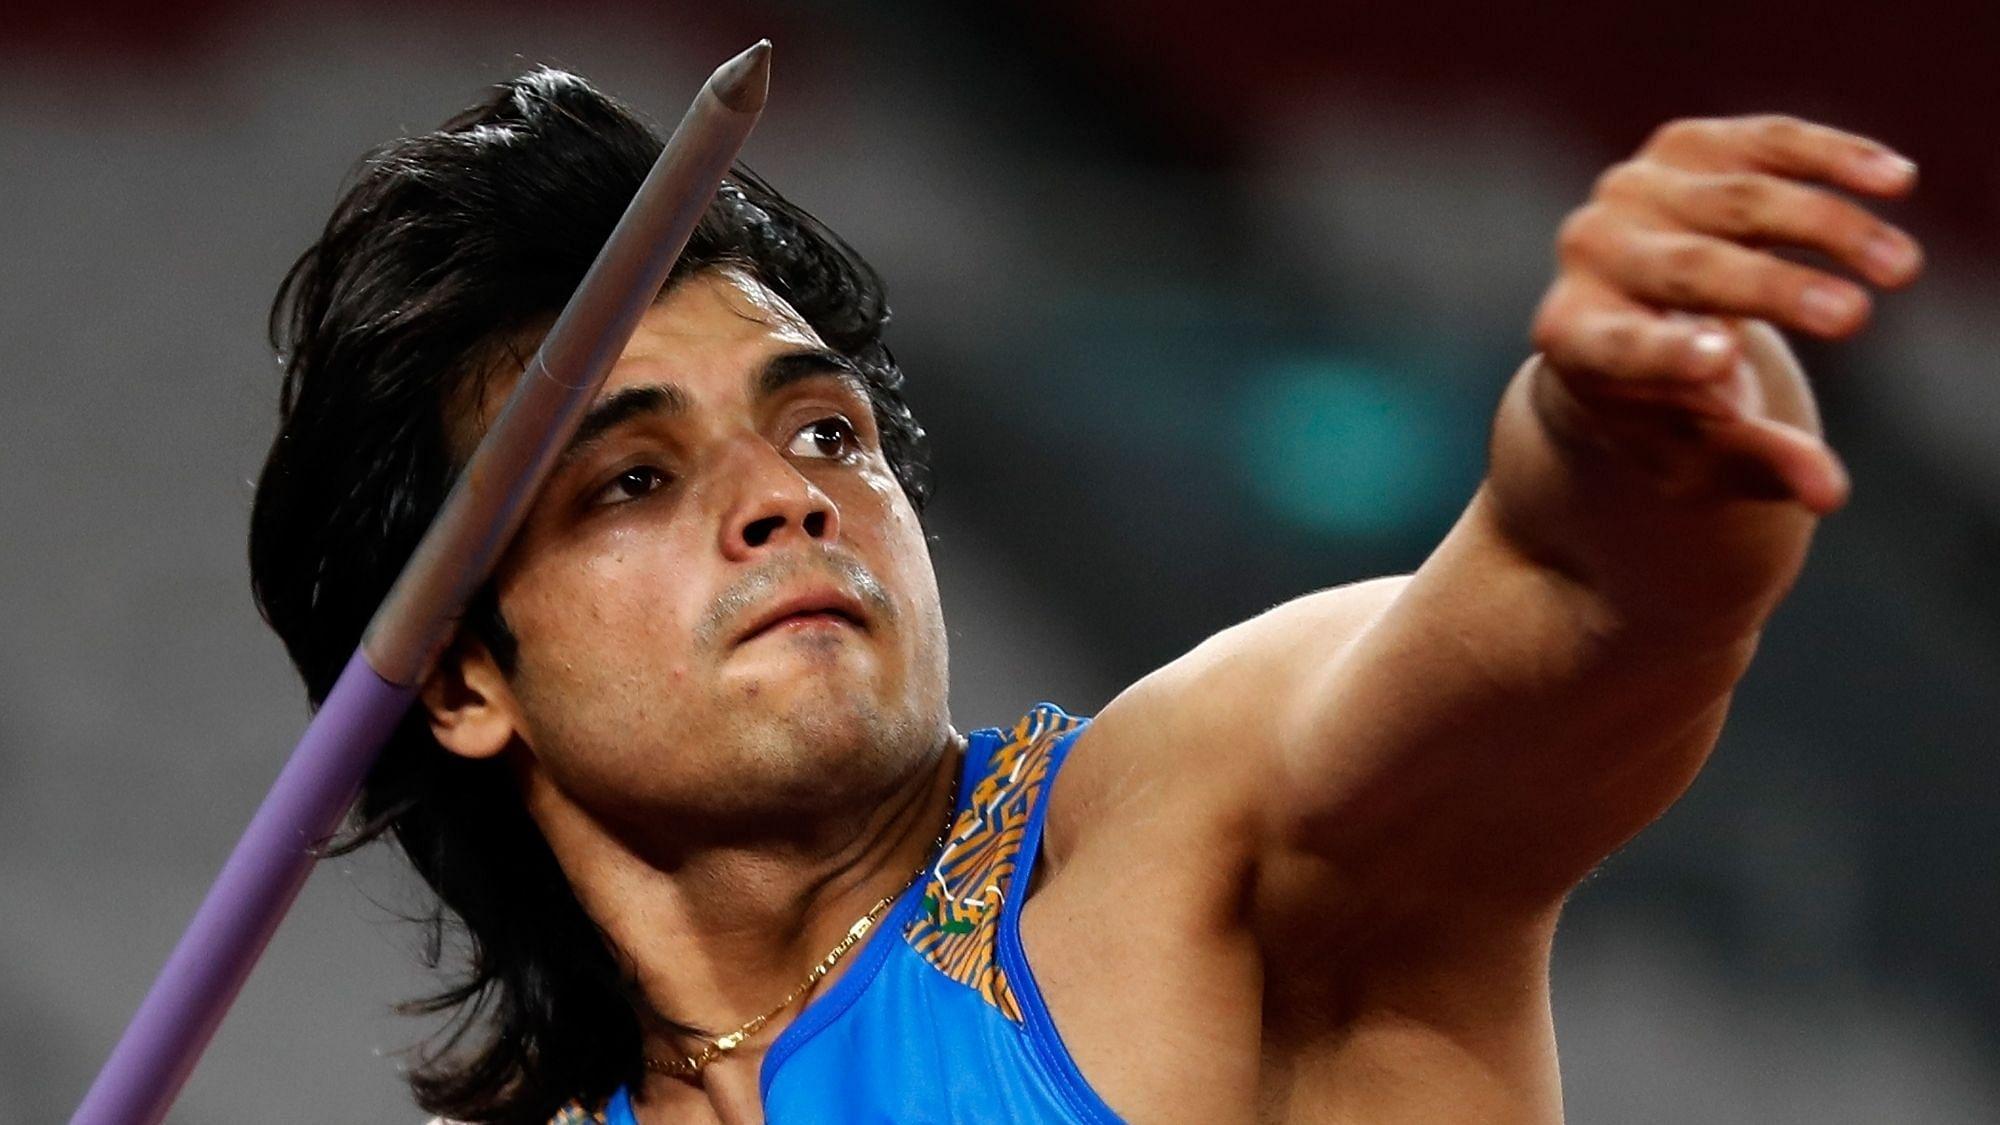 Neeraj Chopra throwing a javelin at the 2020 Tokyo Olympics